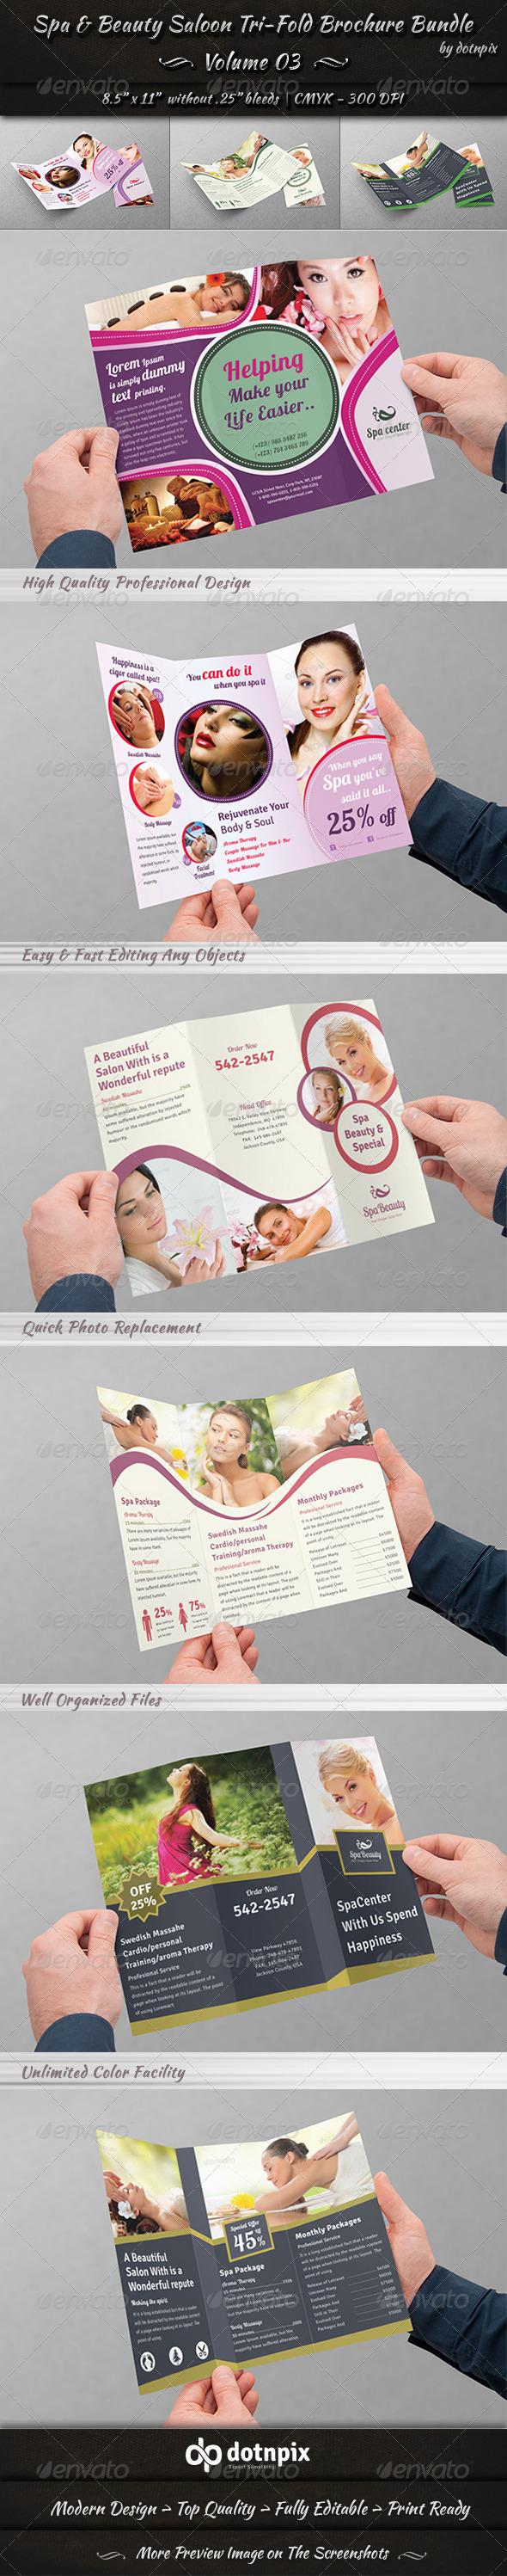 GraphicRiver Spa & Beauty Saloon Tri-fold Brochure Bundle v3 8173558